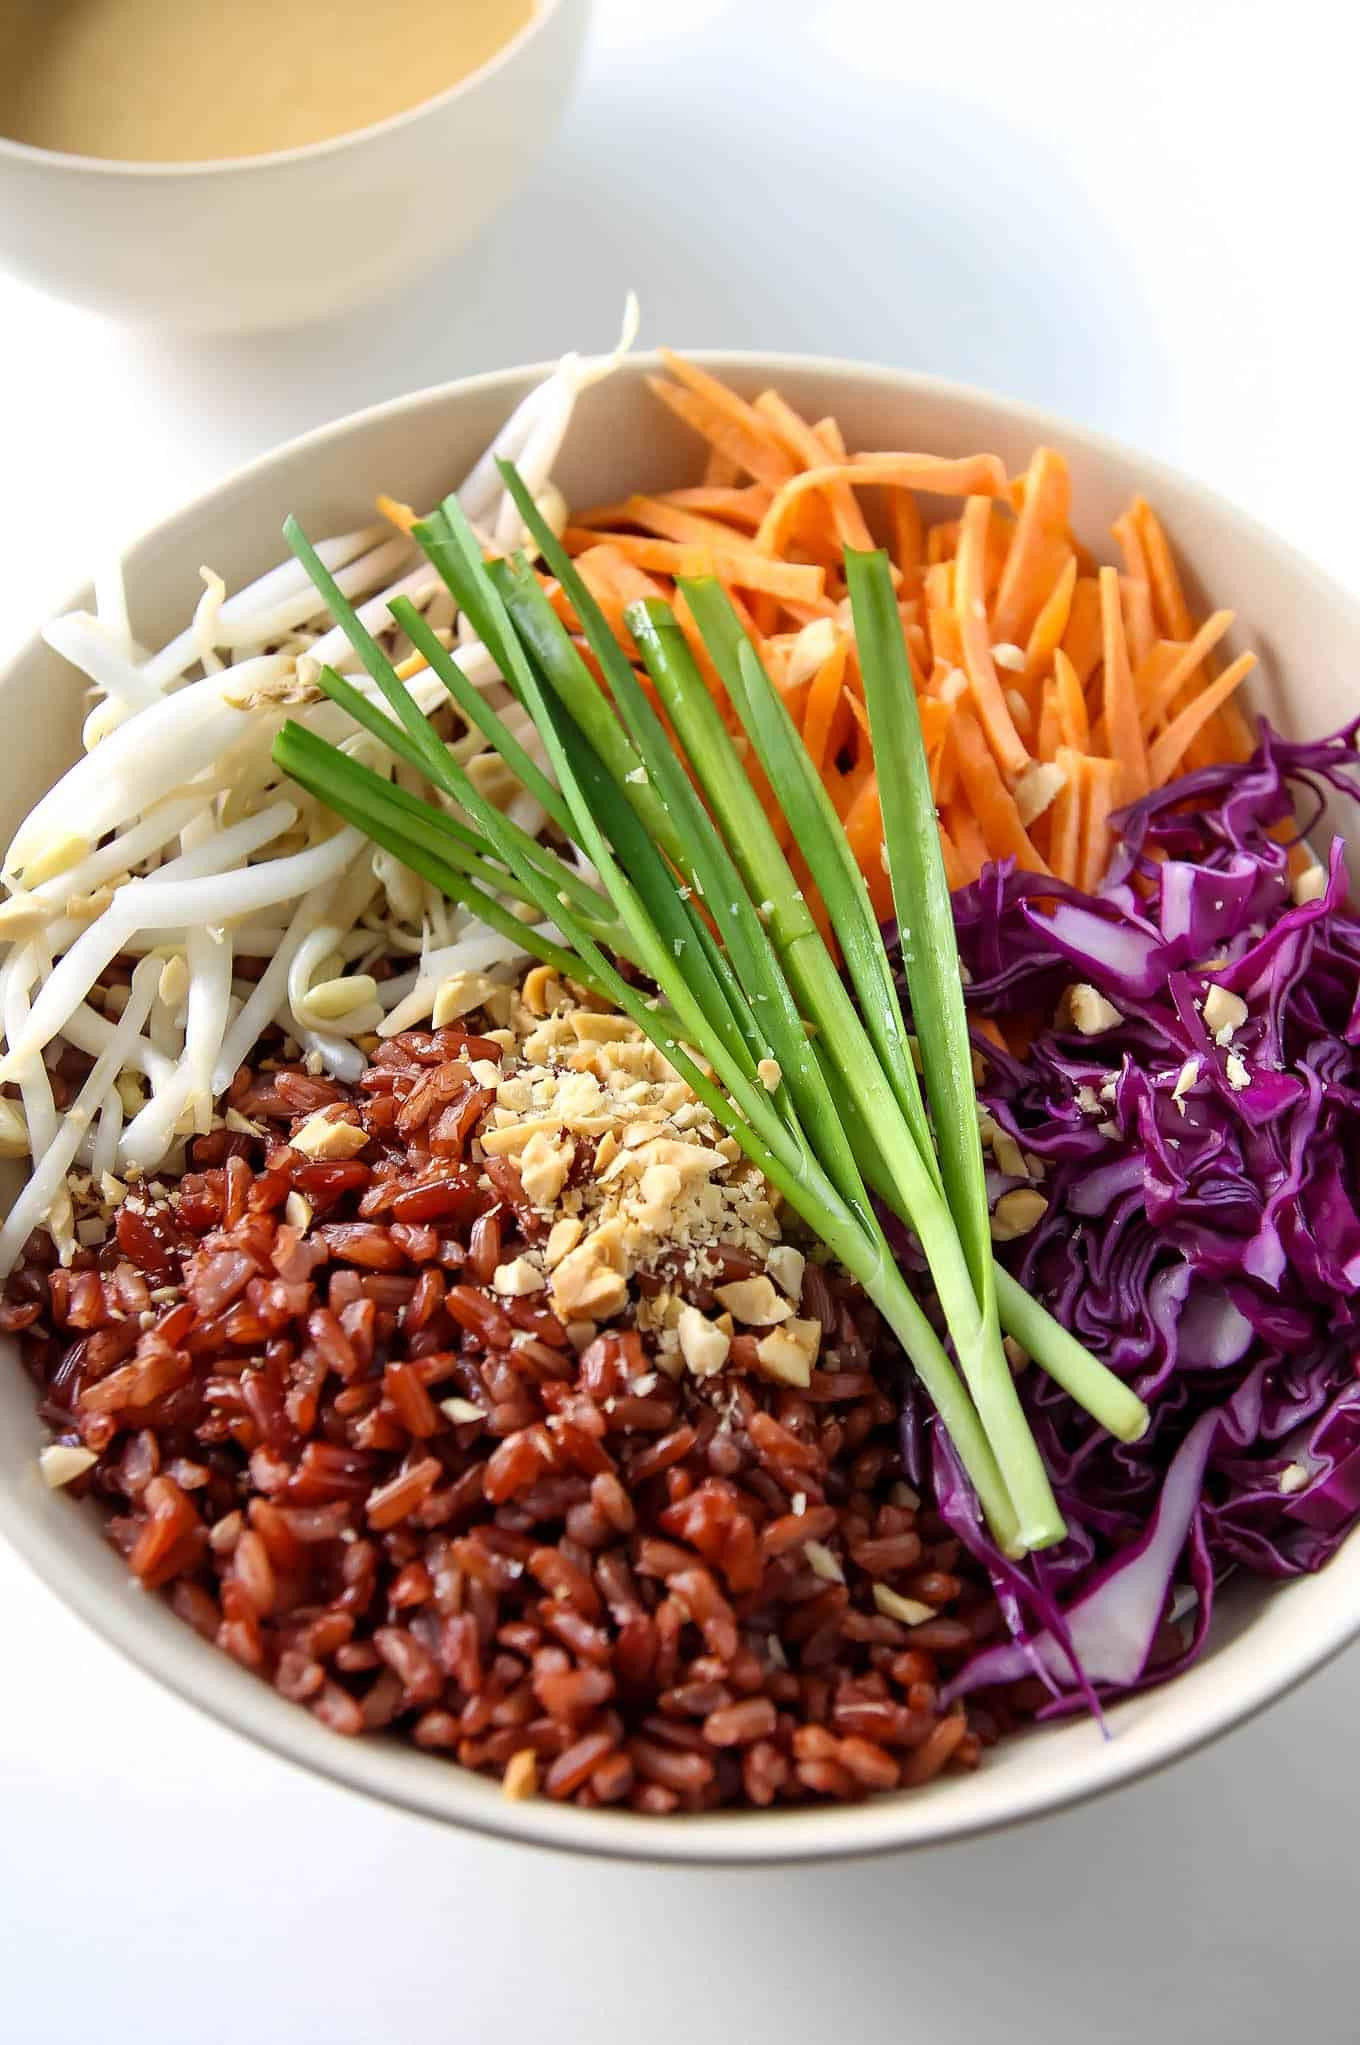 Healthy Sauces For Rice  Thai Buddha Bowl with Peanut Sauce VIDEO • LeelaLicious